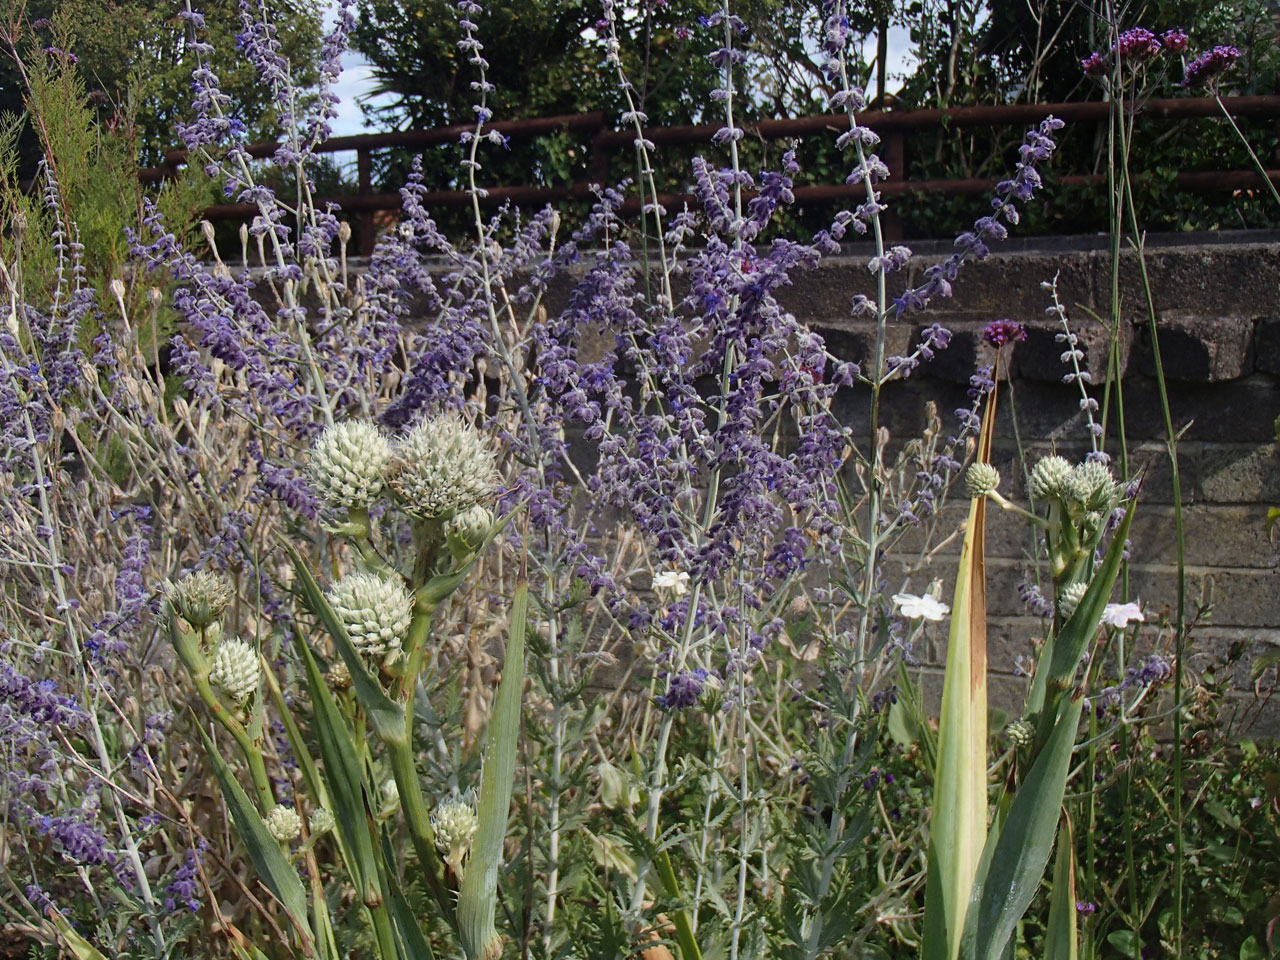 Eryngium yuccifolium and Perovskia 'Blue Spire'